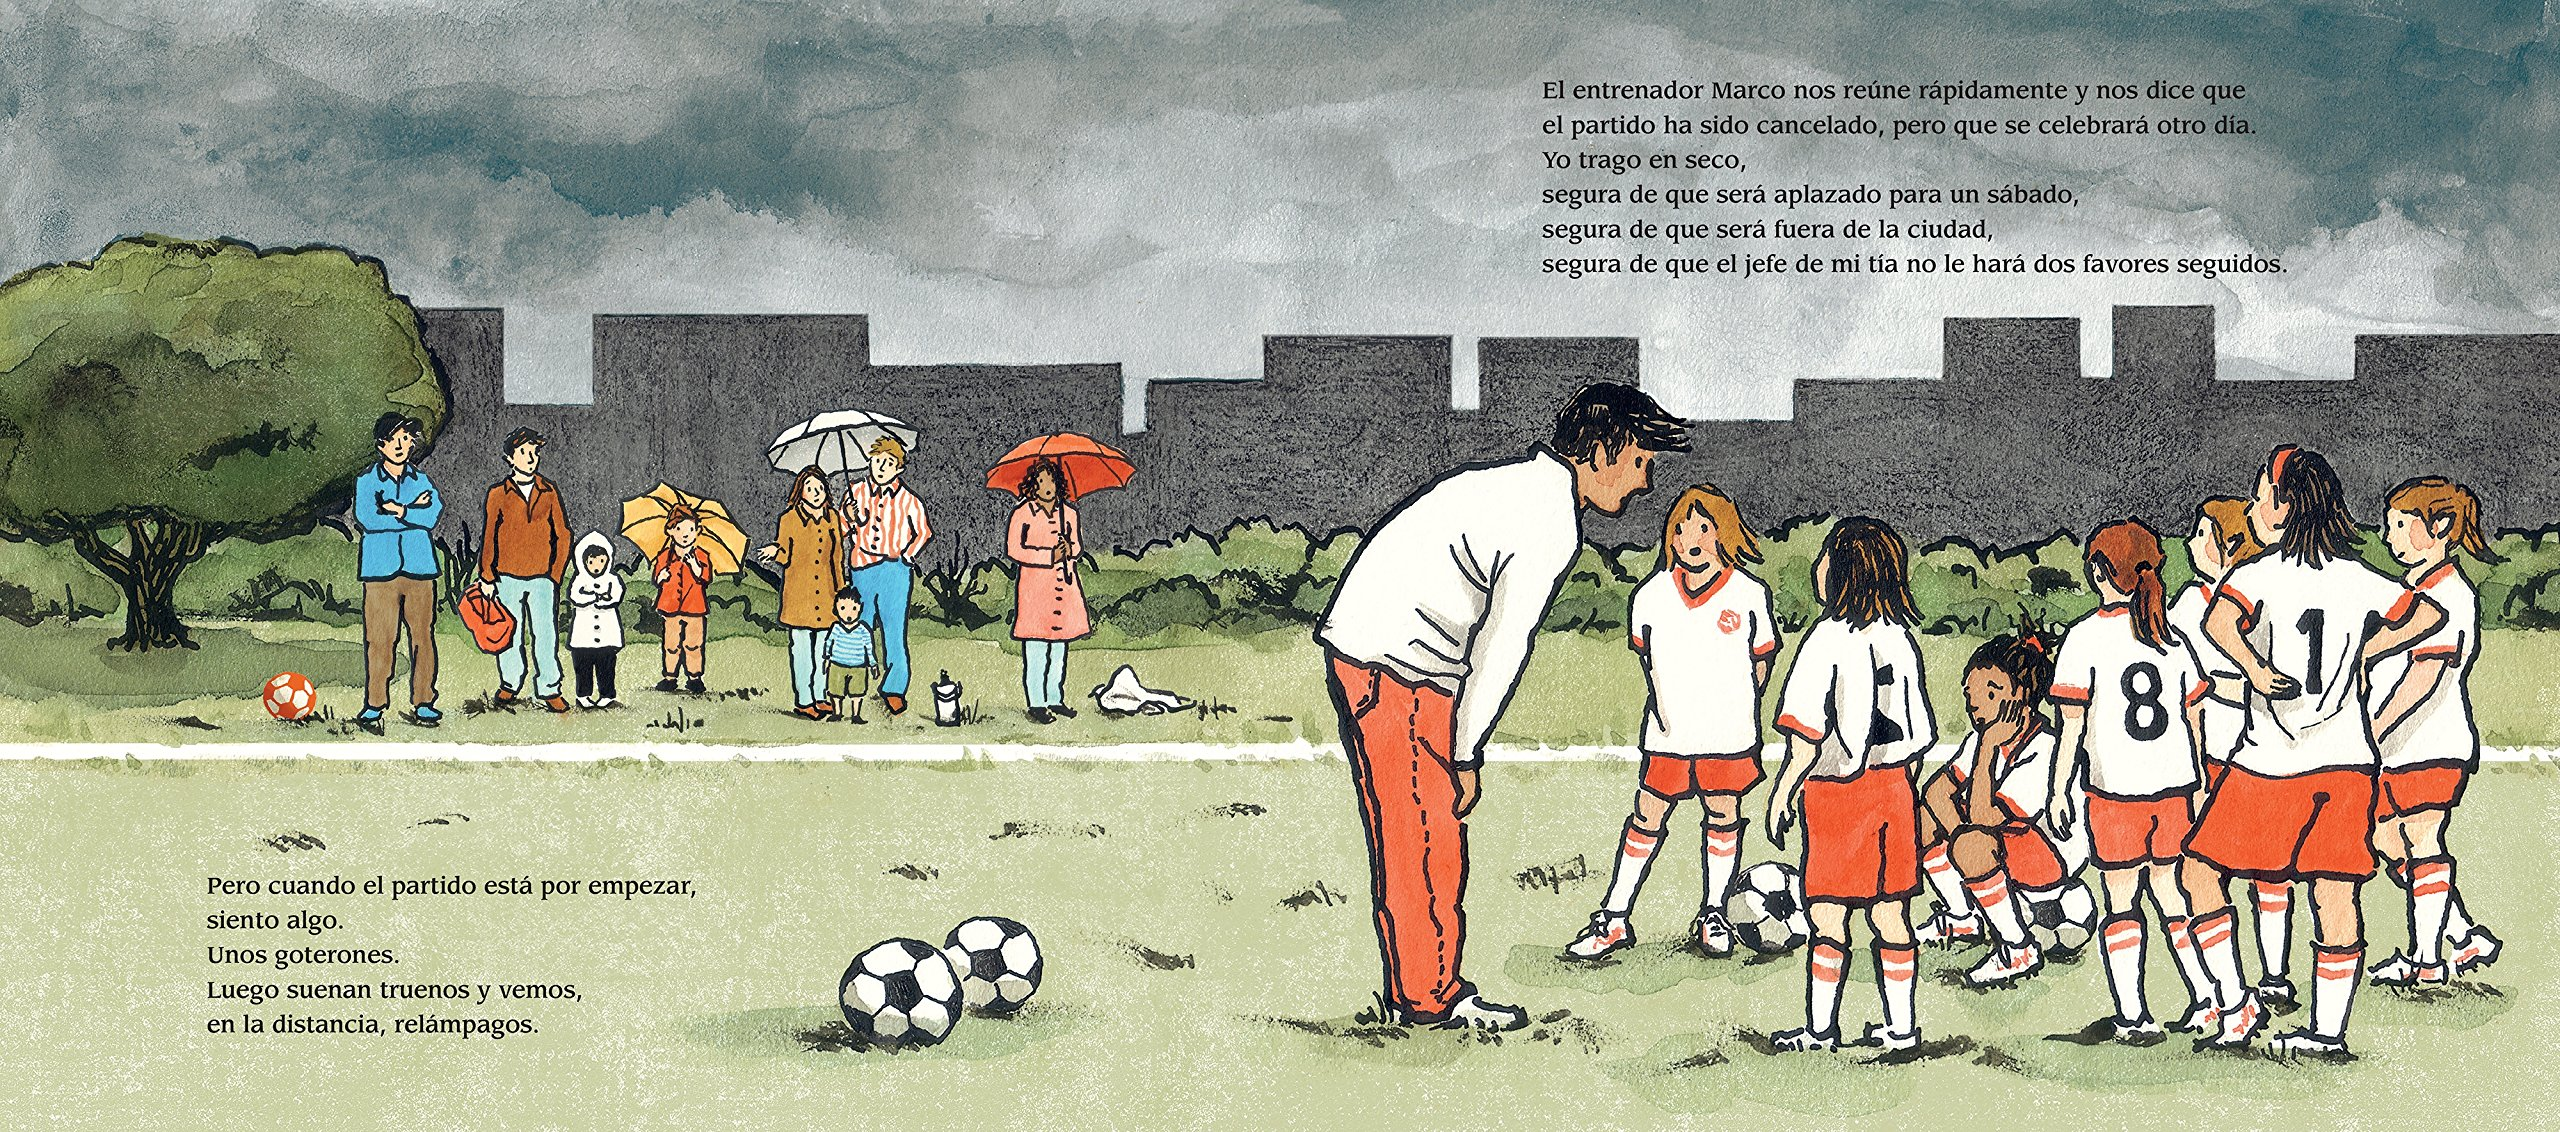 El fútbol me hace feliz (Spanish Edition): Maribeth Boelts, Lauren Castillo: 9780763689056: Amazon.com: Books